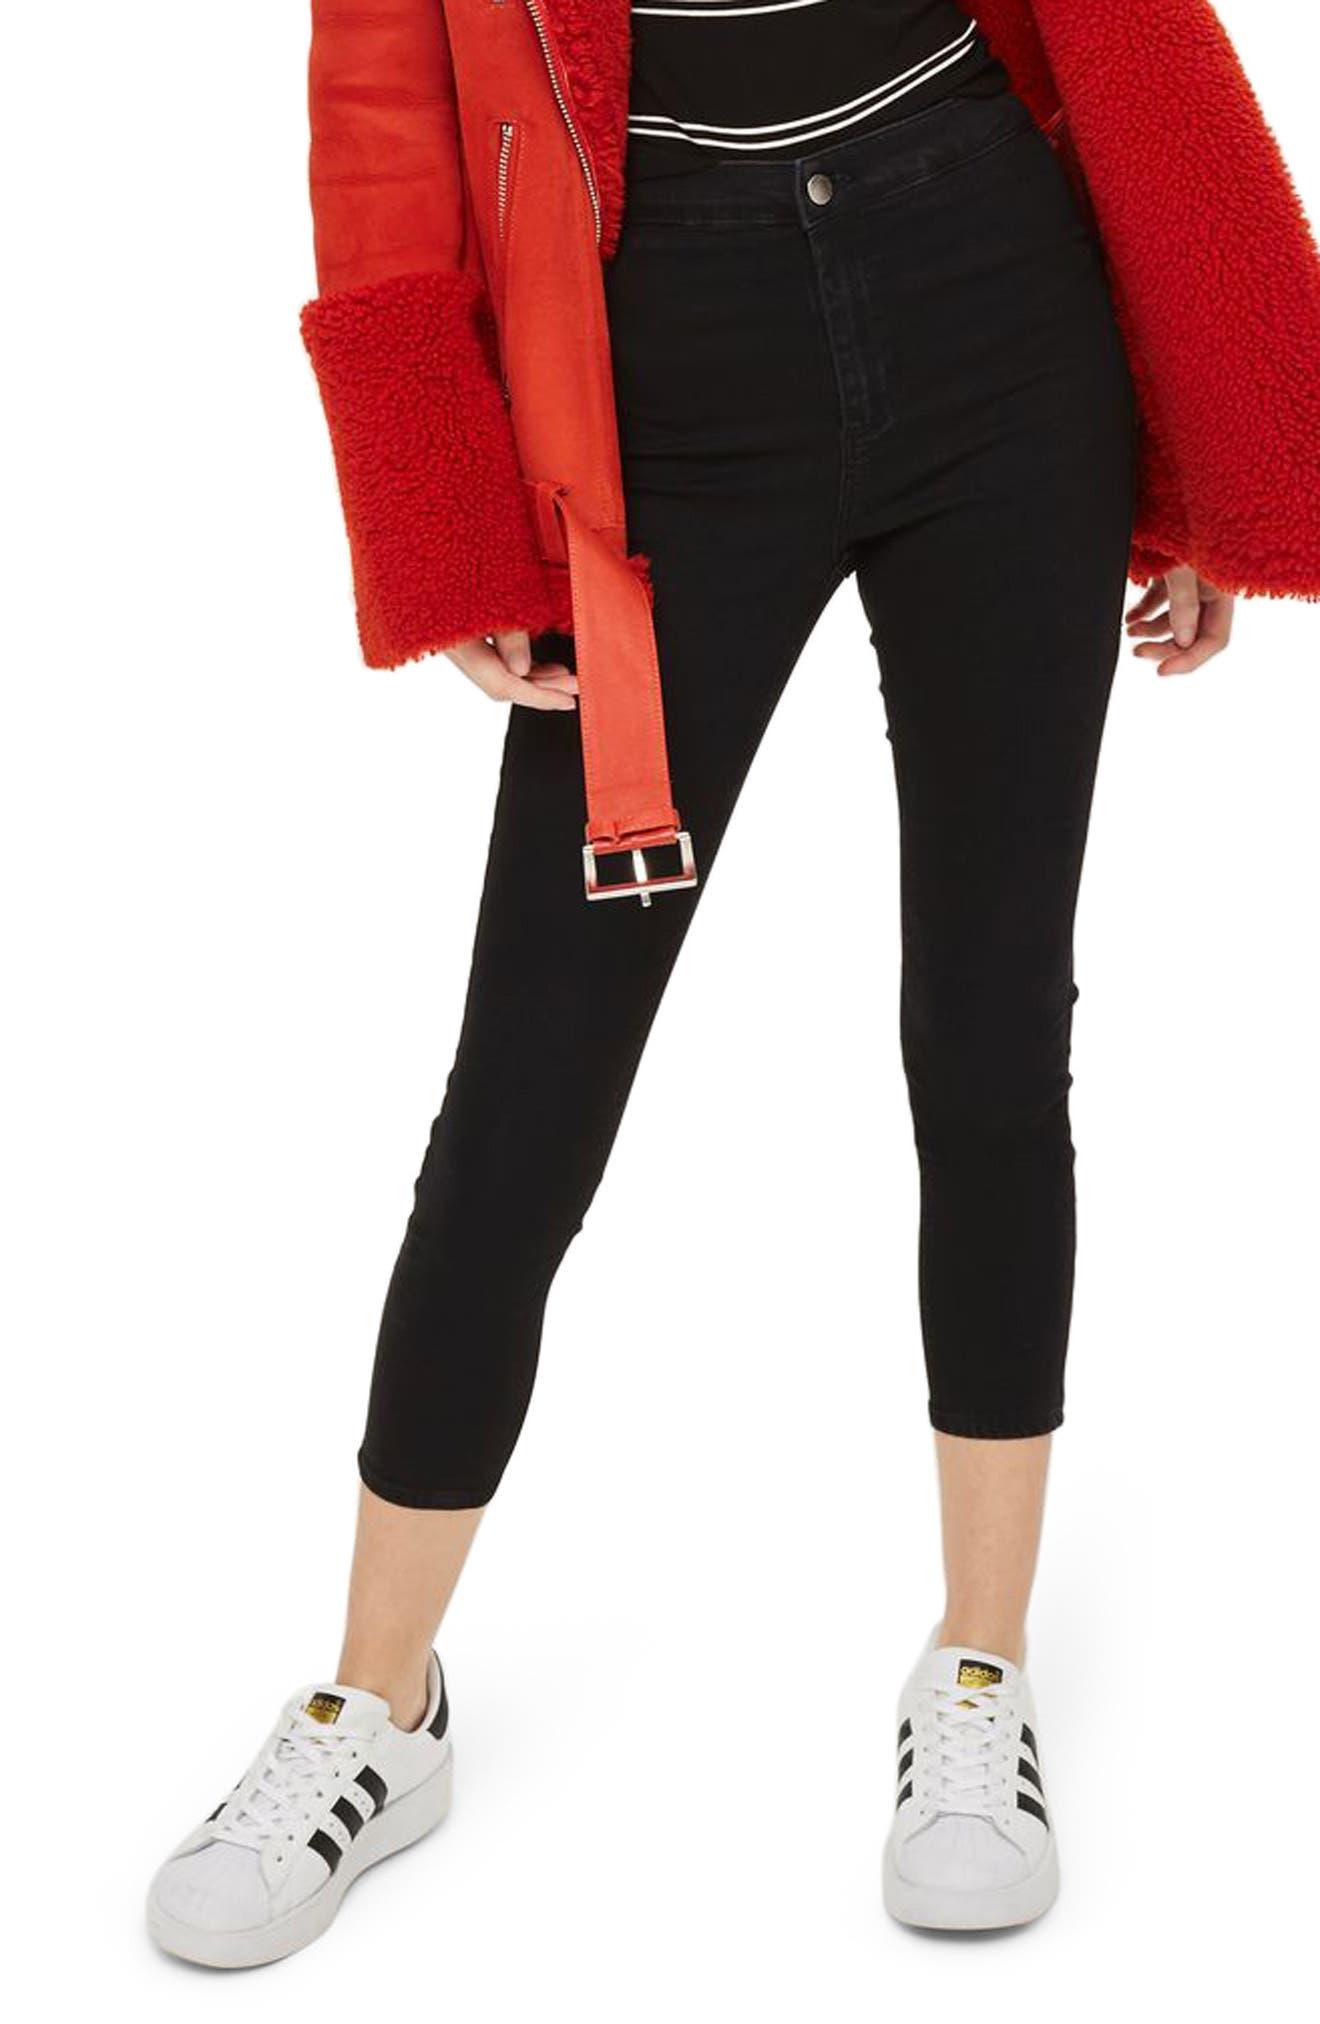 Topshop Joni High Waist Crop Skinny Jeans (Petite)